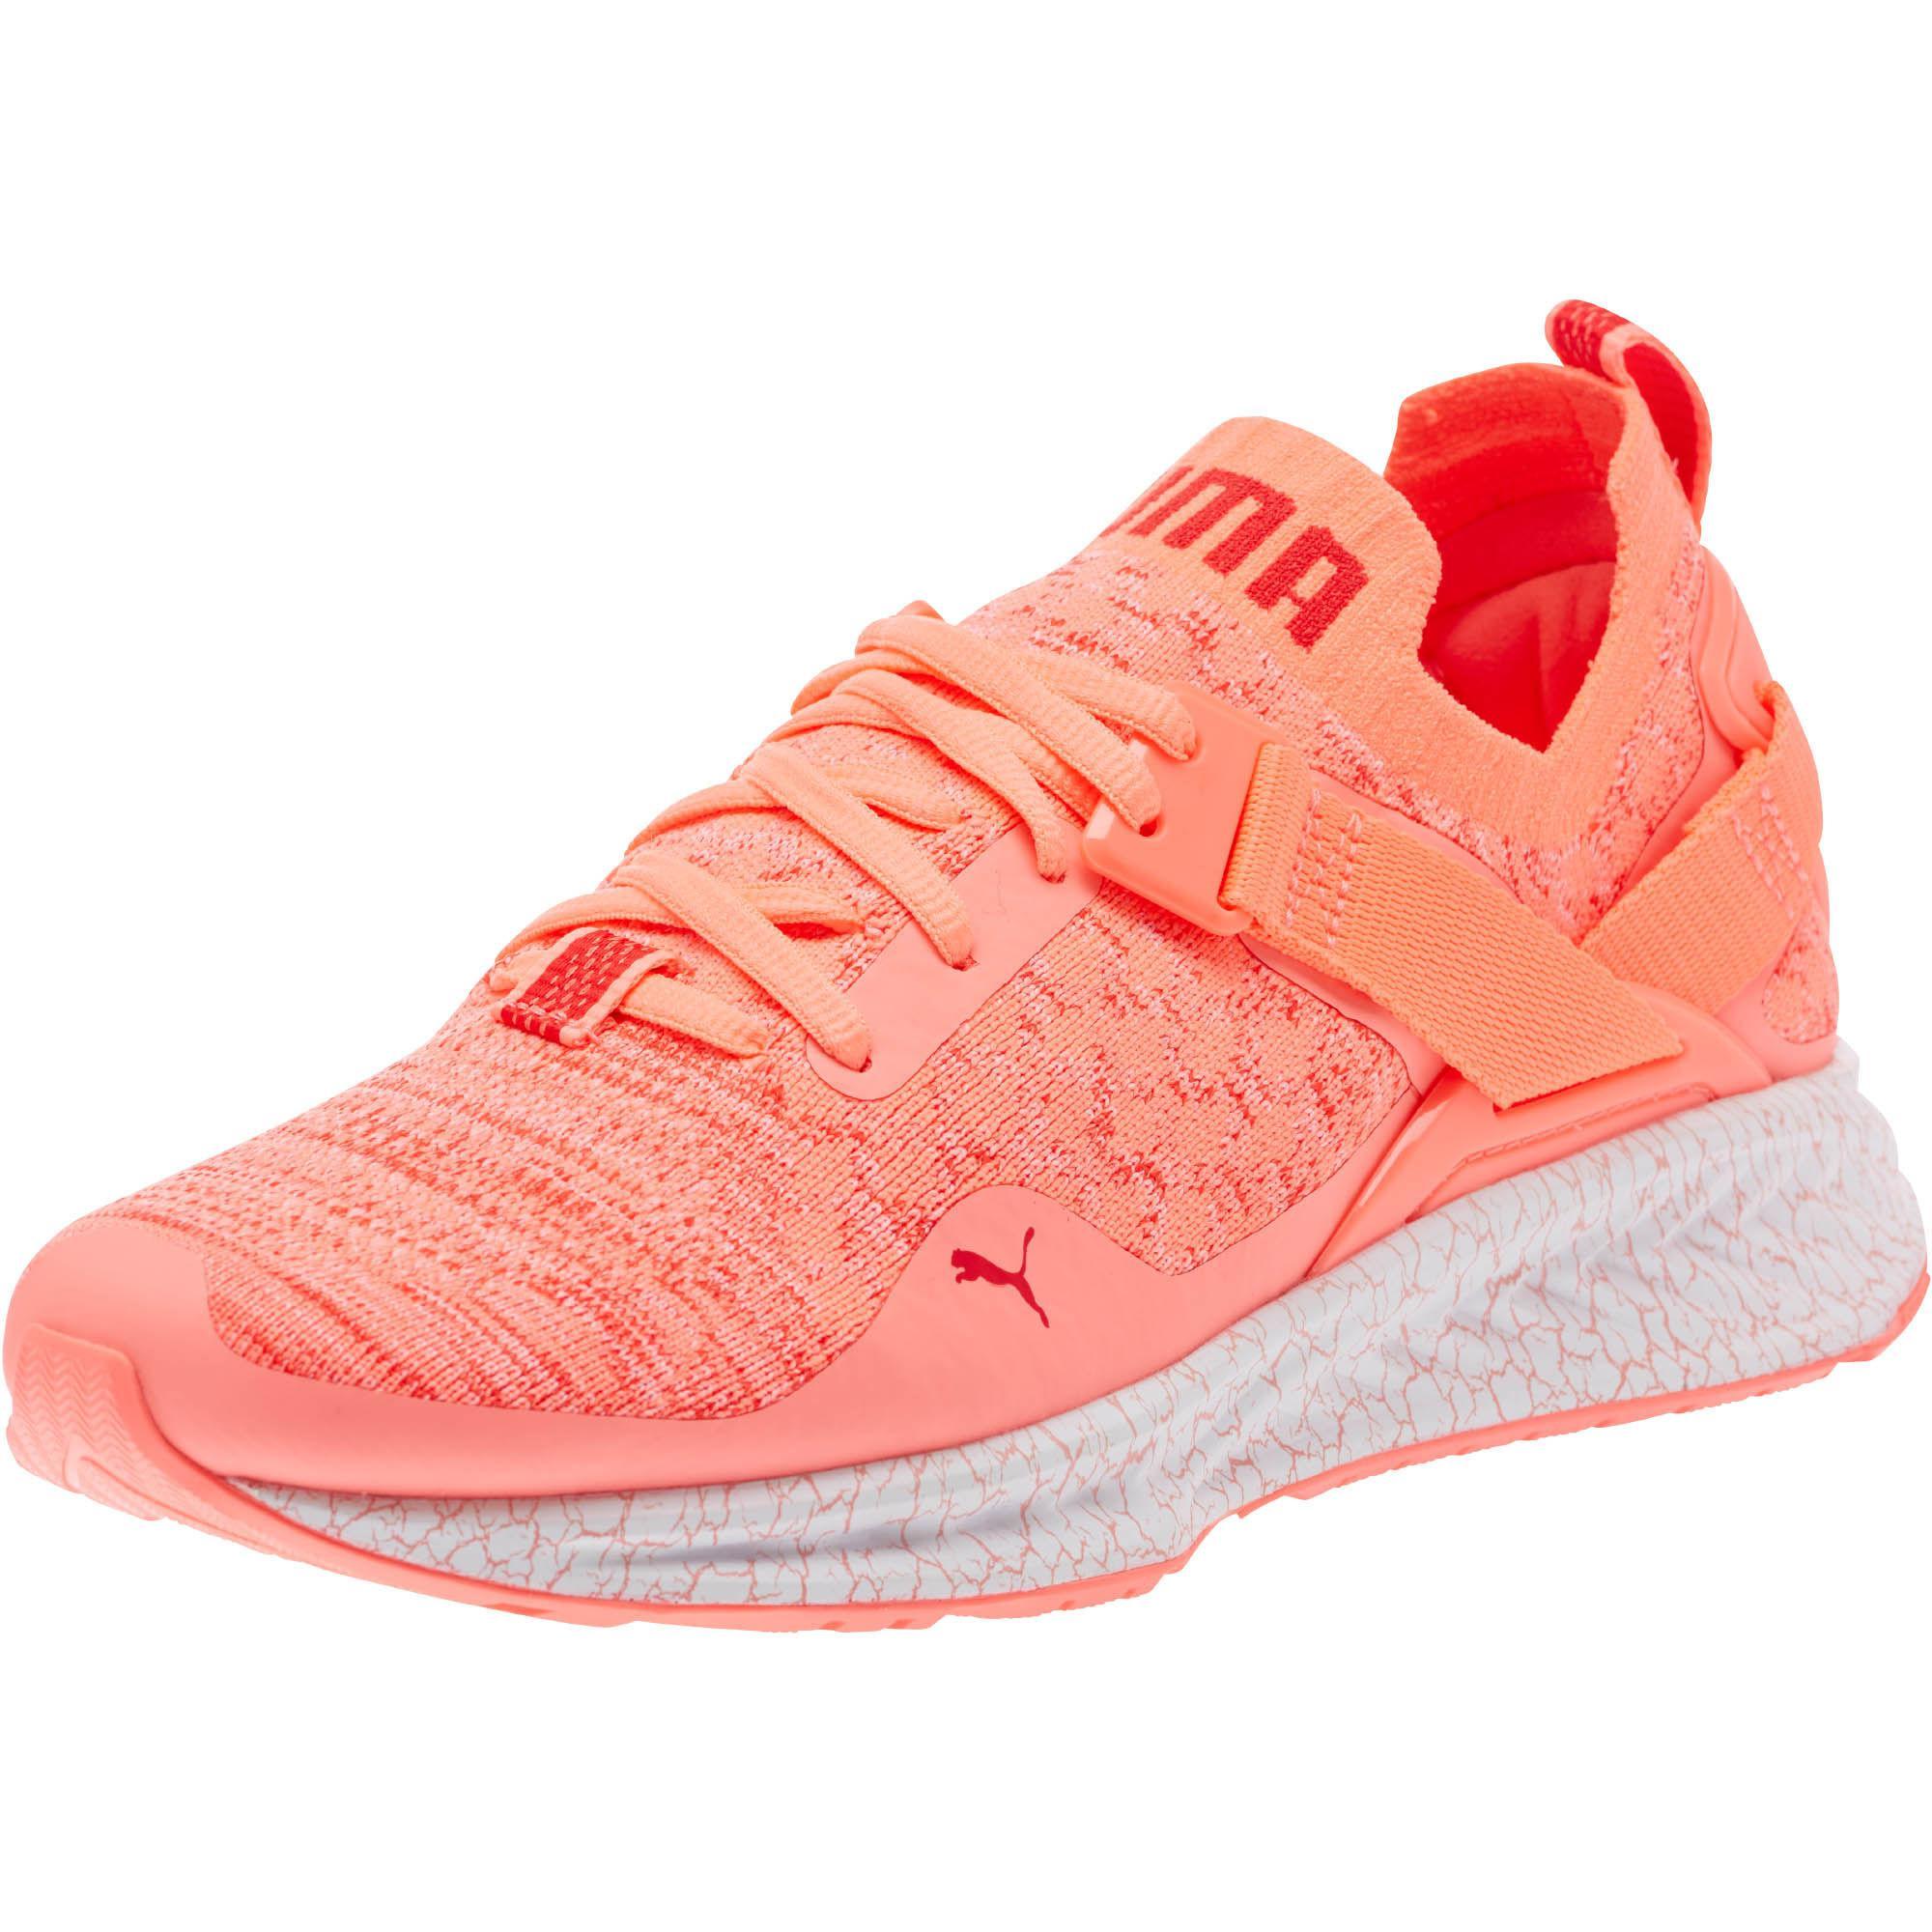 ef9e070be9b Lyst - PUMA Ignite Evoknit Lo Hypernature Women s Training Shoes in Red